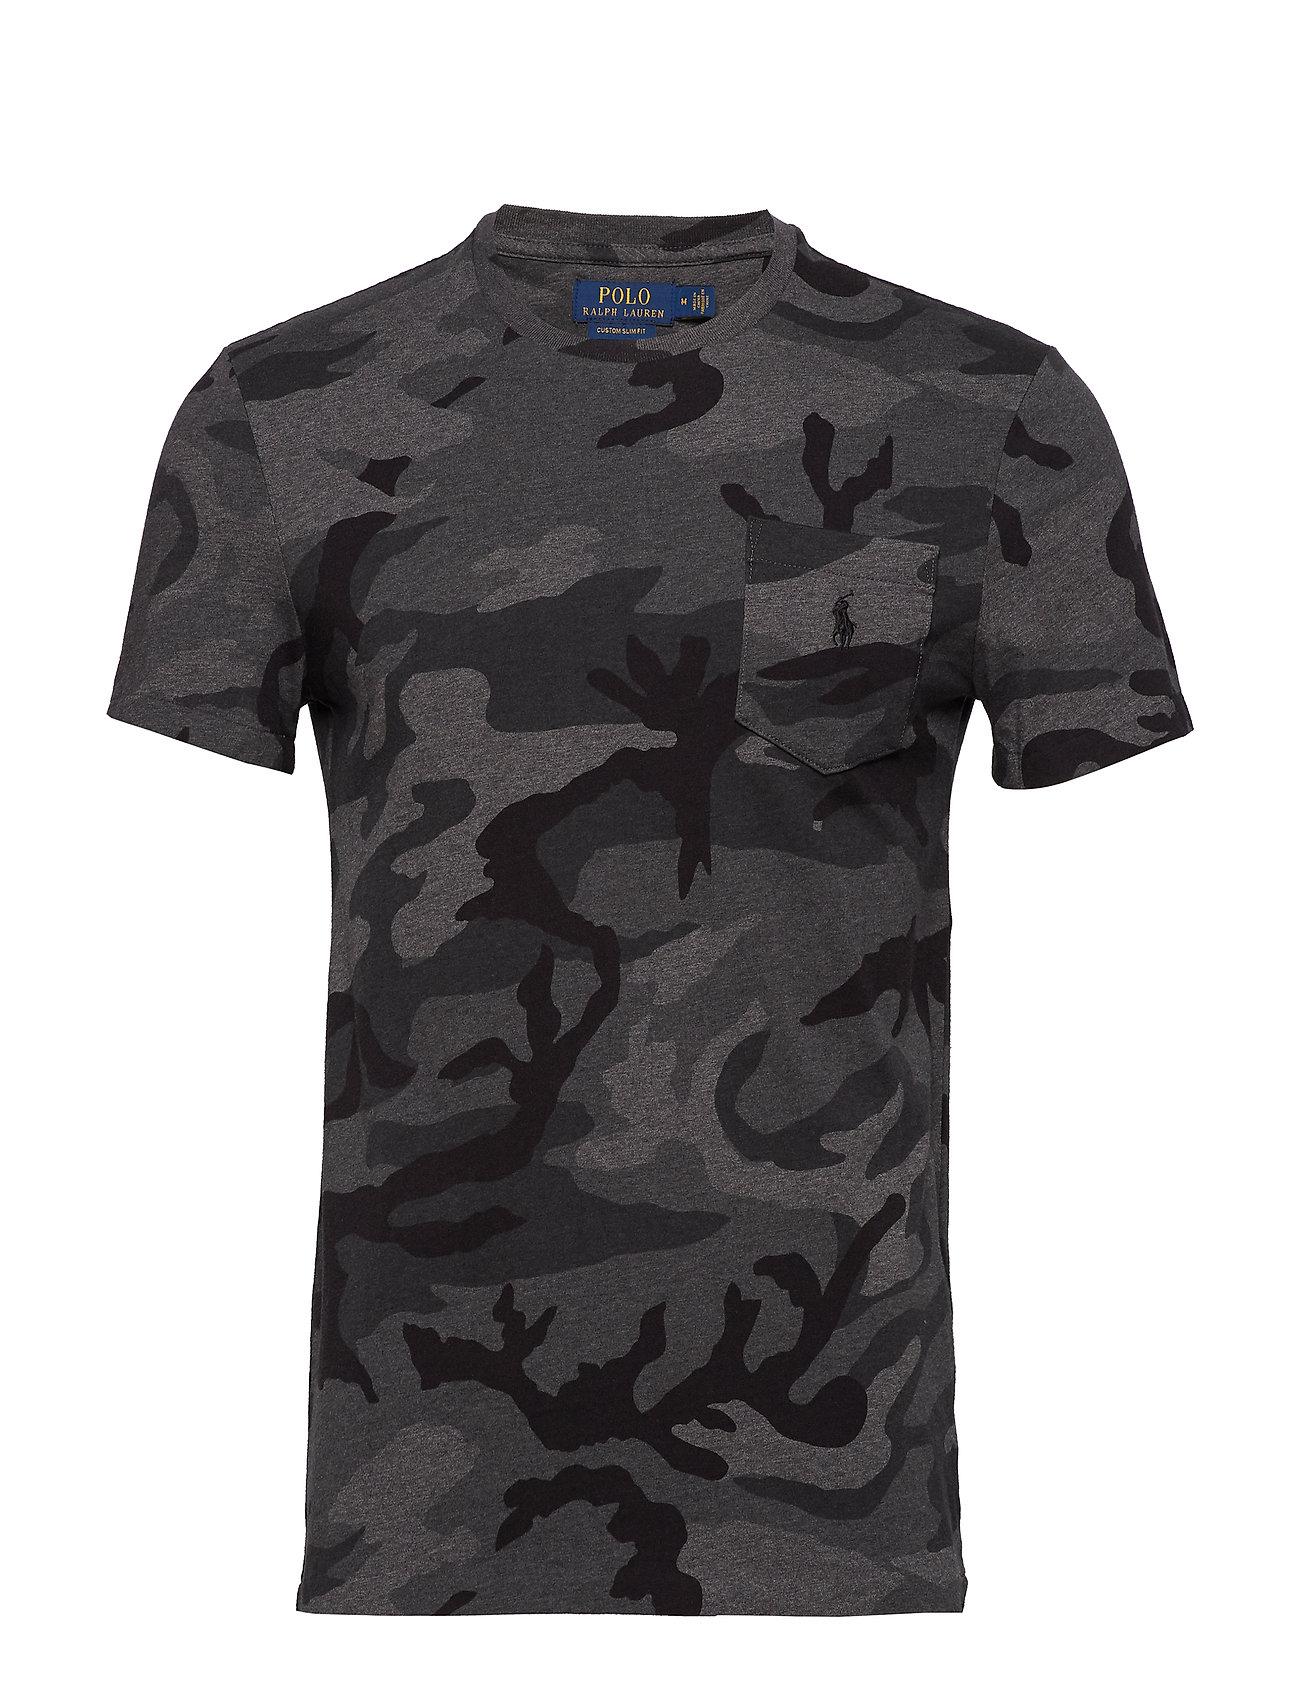 90ac1646e Custom Slim Fit Cotton T-shirt (Charcoal Rl Camo) (£69) - Polo Ralph ...